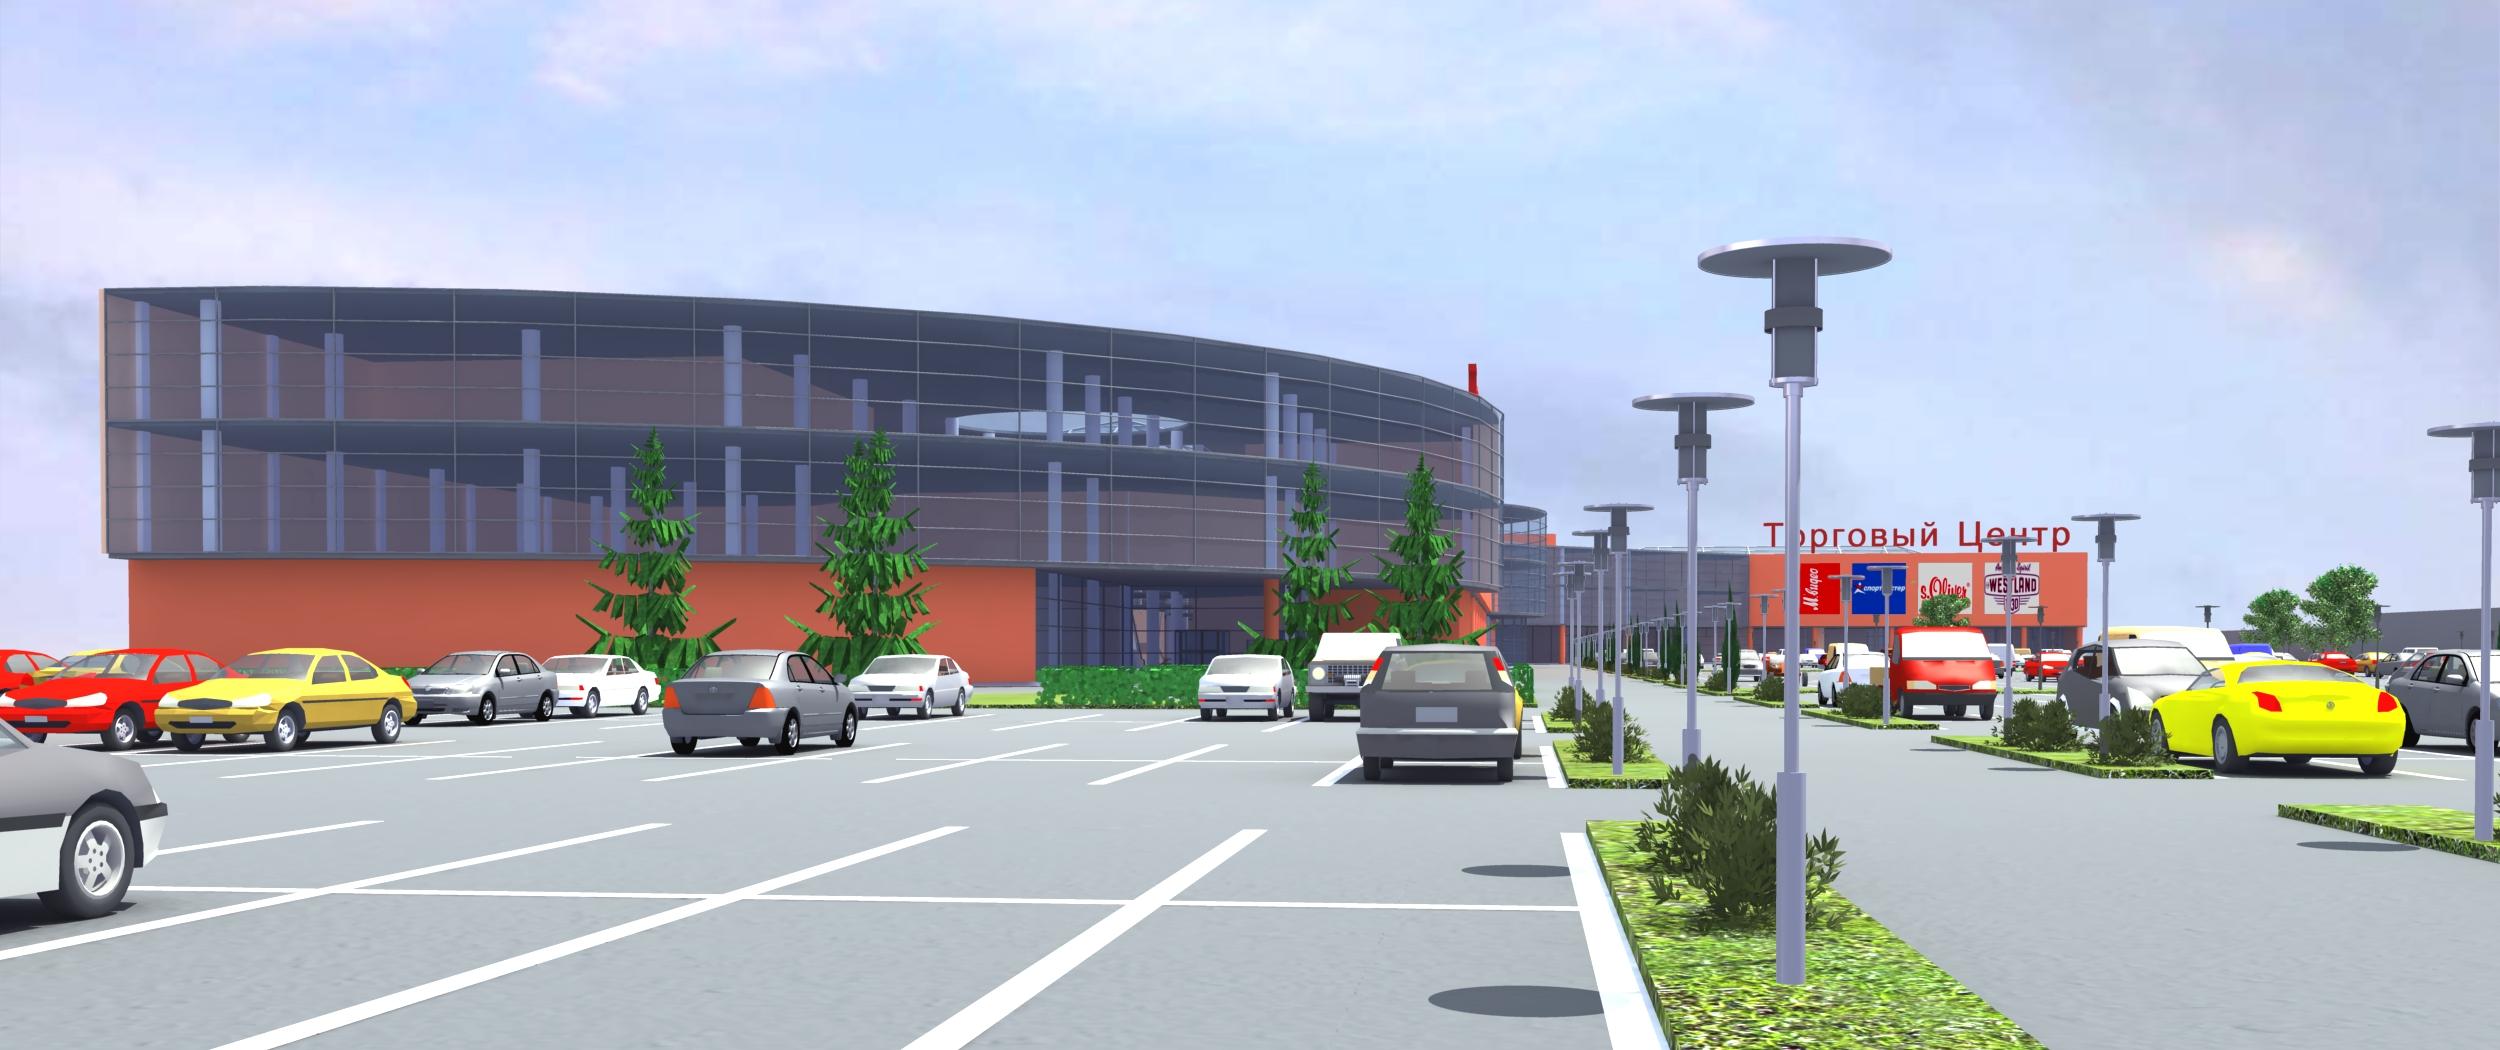 Архитектура торгового центра